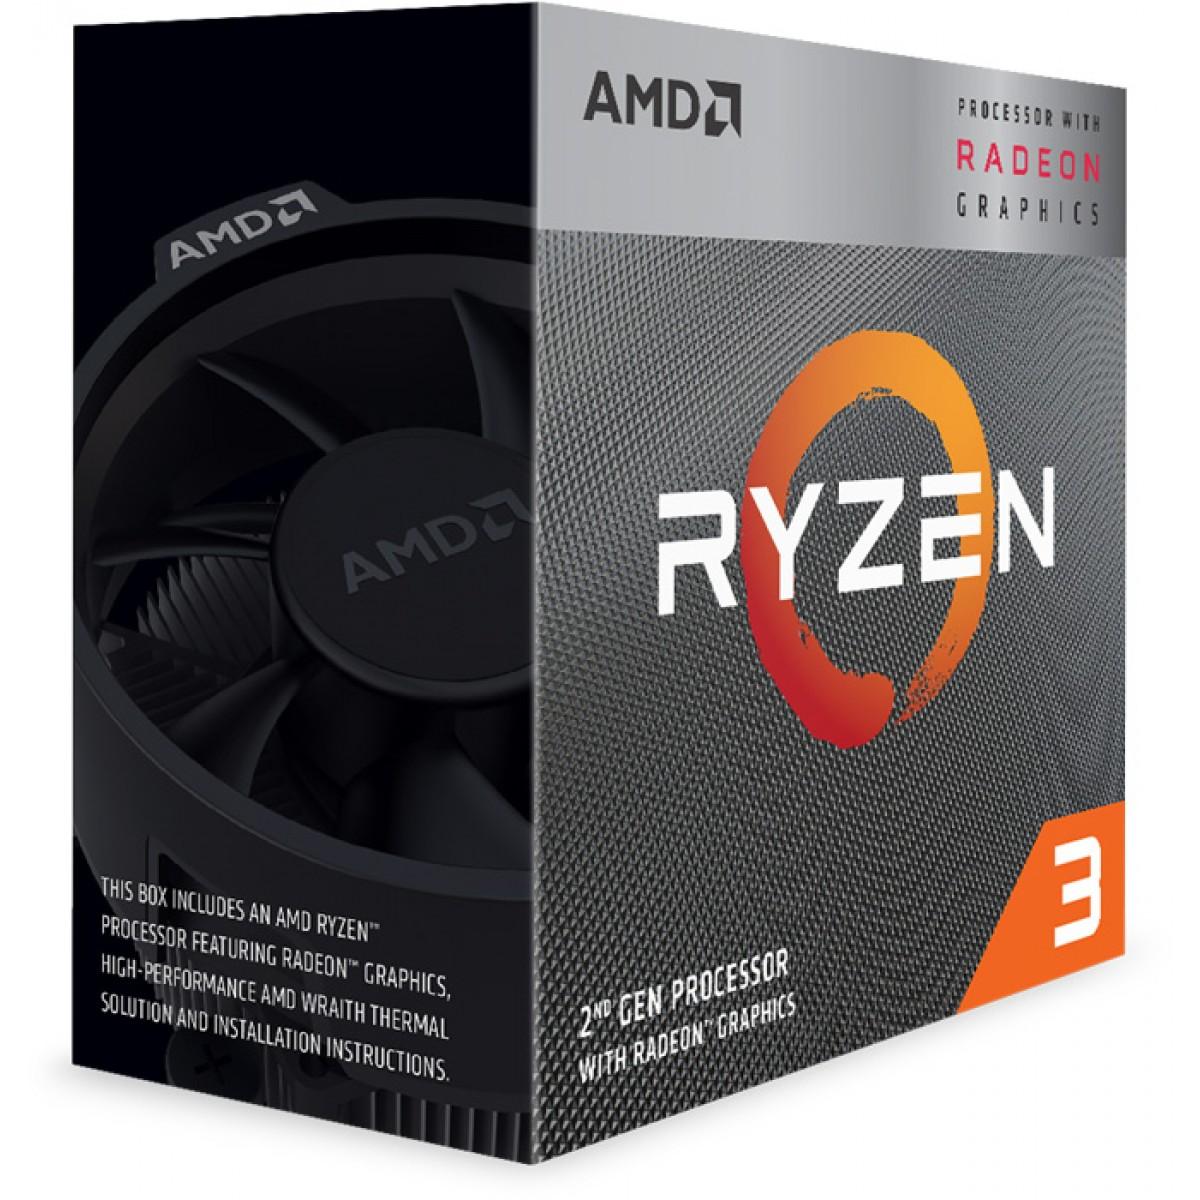 Processador AMD Ryzen 3 3200G 3.6GHz (4.0GHz Turbo), 4-Cores 4-Threads, Cooler Wraith Stealth, AM4 - Open Box